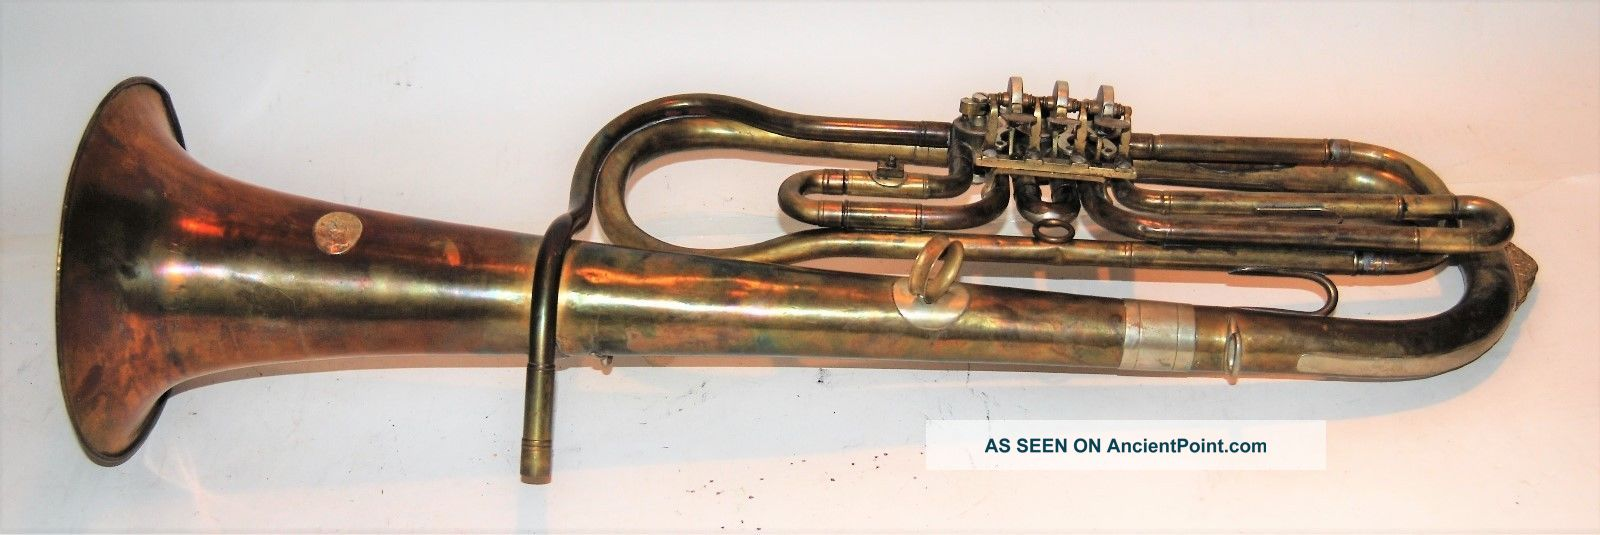 Tenor Horn By Adolfo Lapini - 1899 3 Rotary Valve,  Tall Design Brass photo